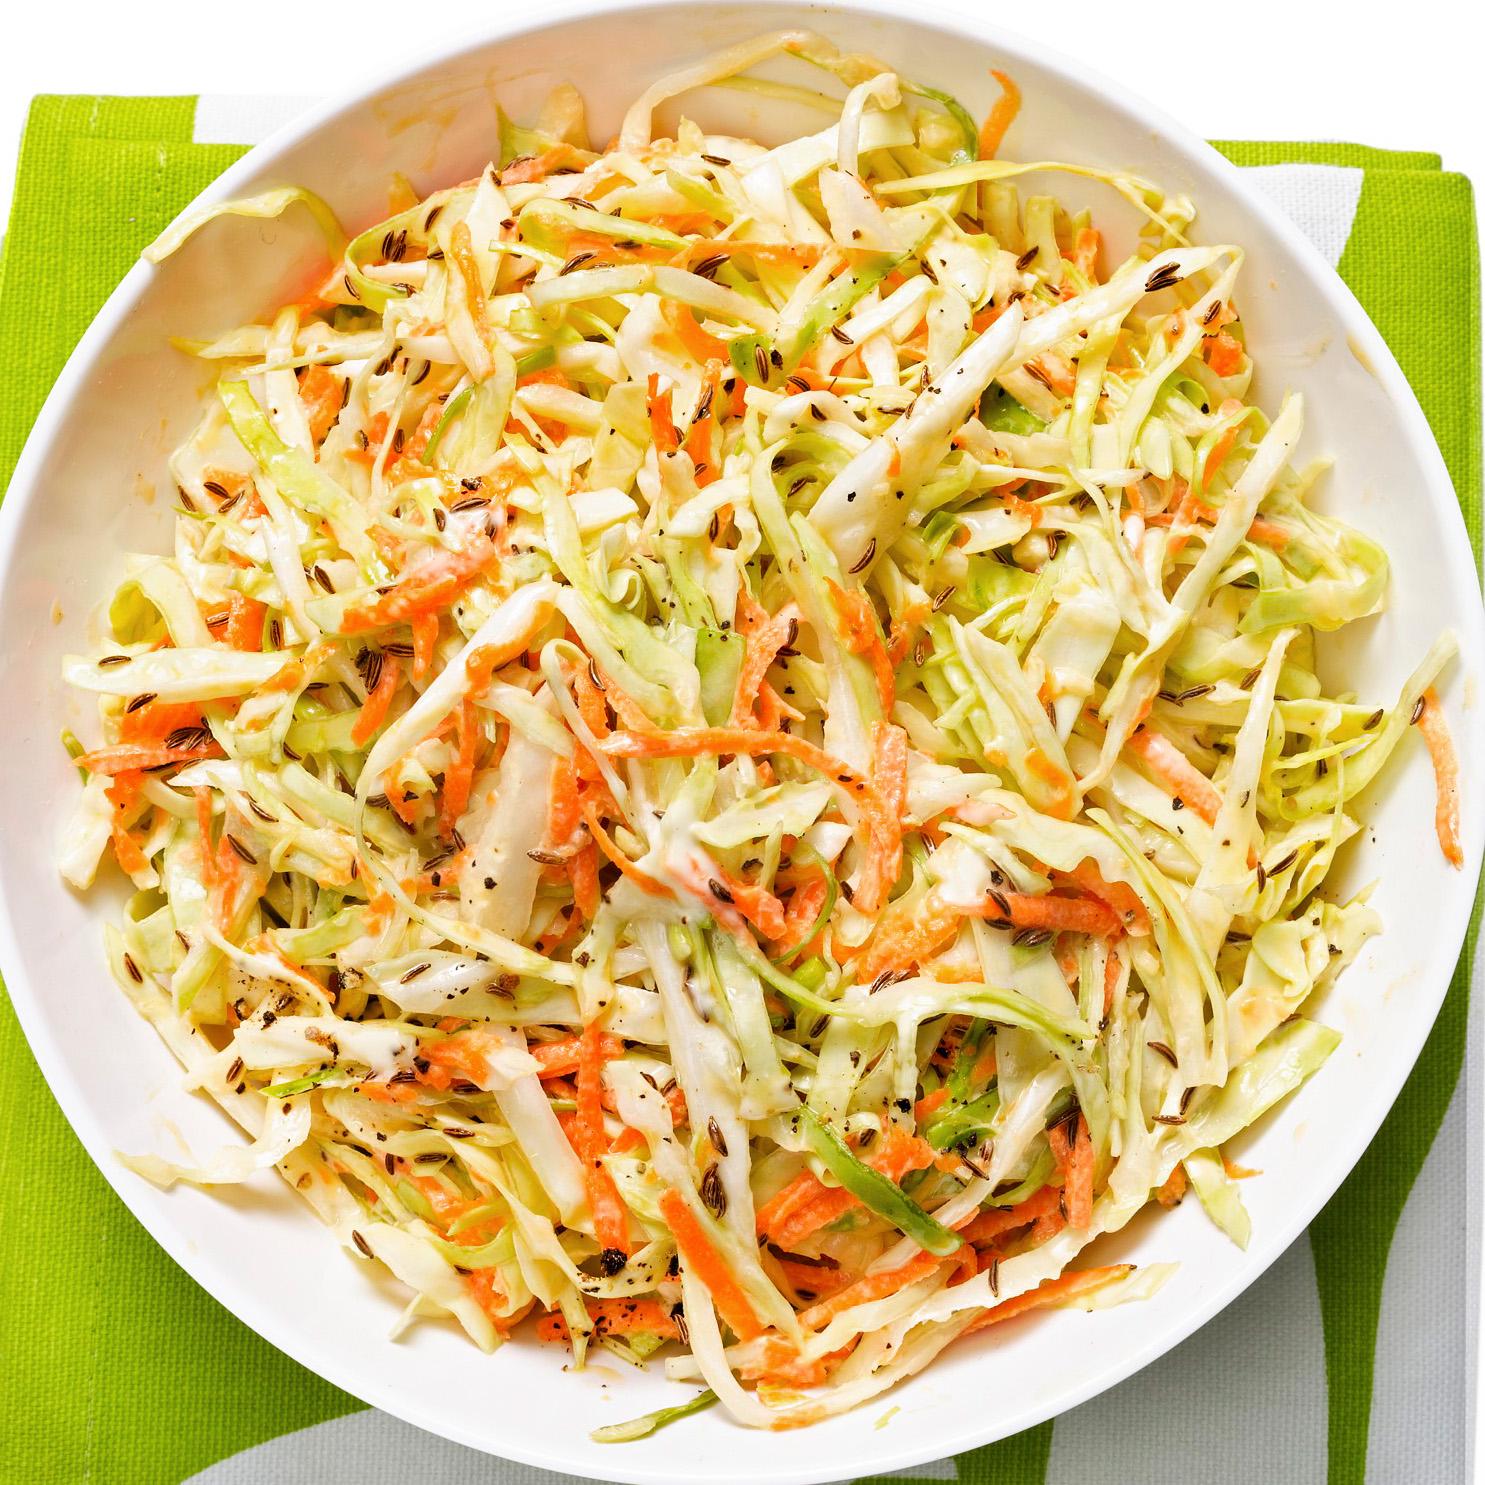 Green Cabbage Coleslaw